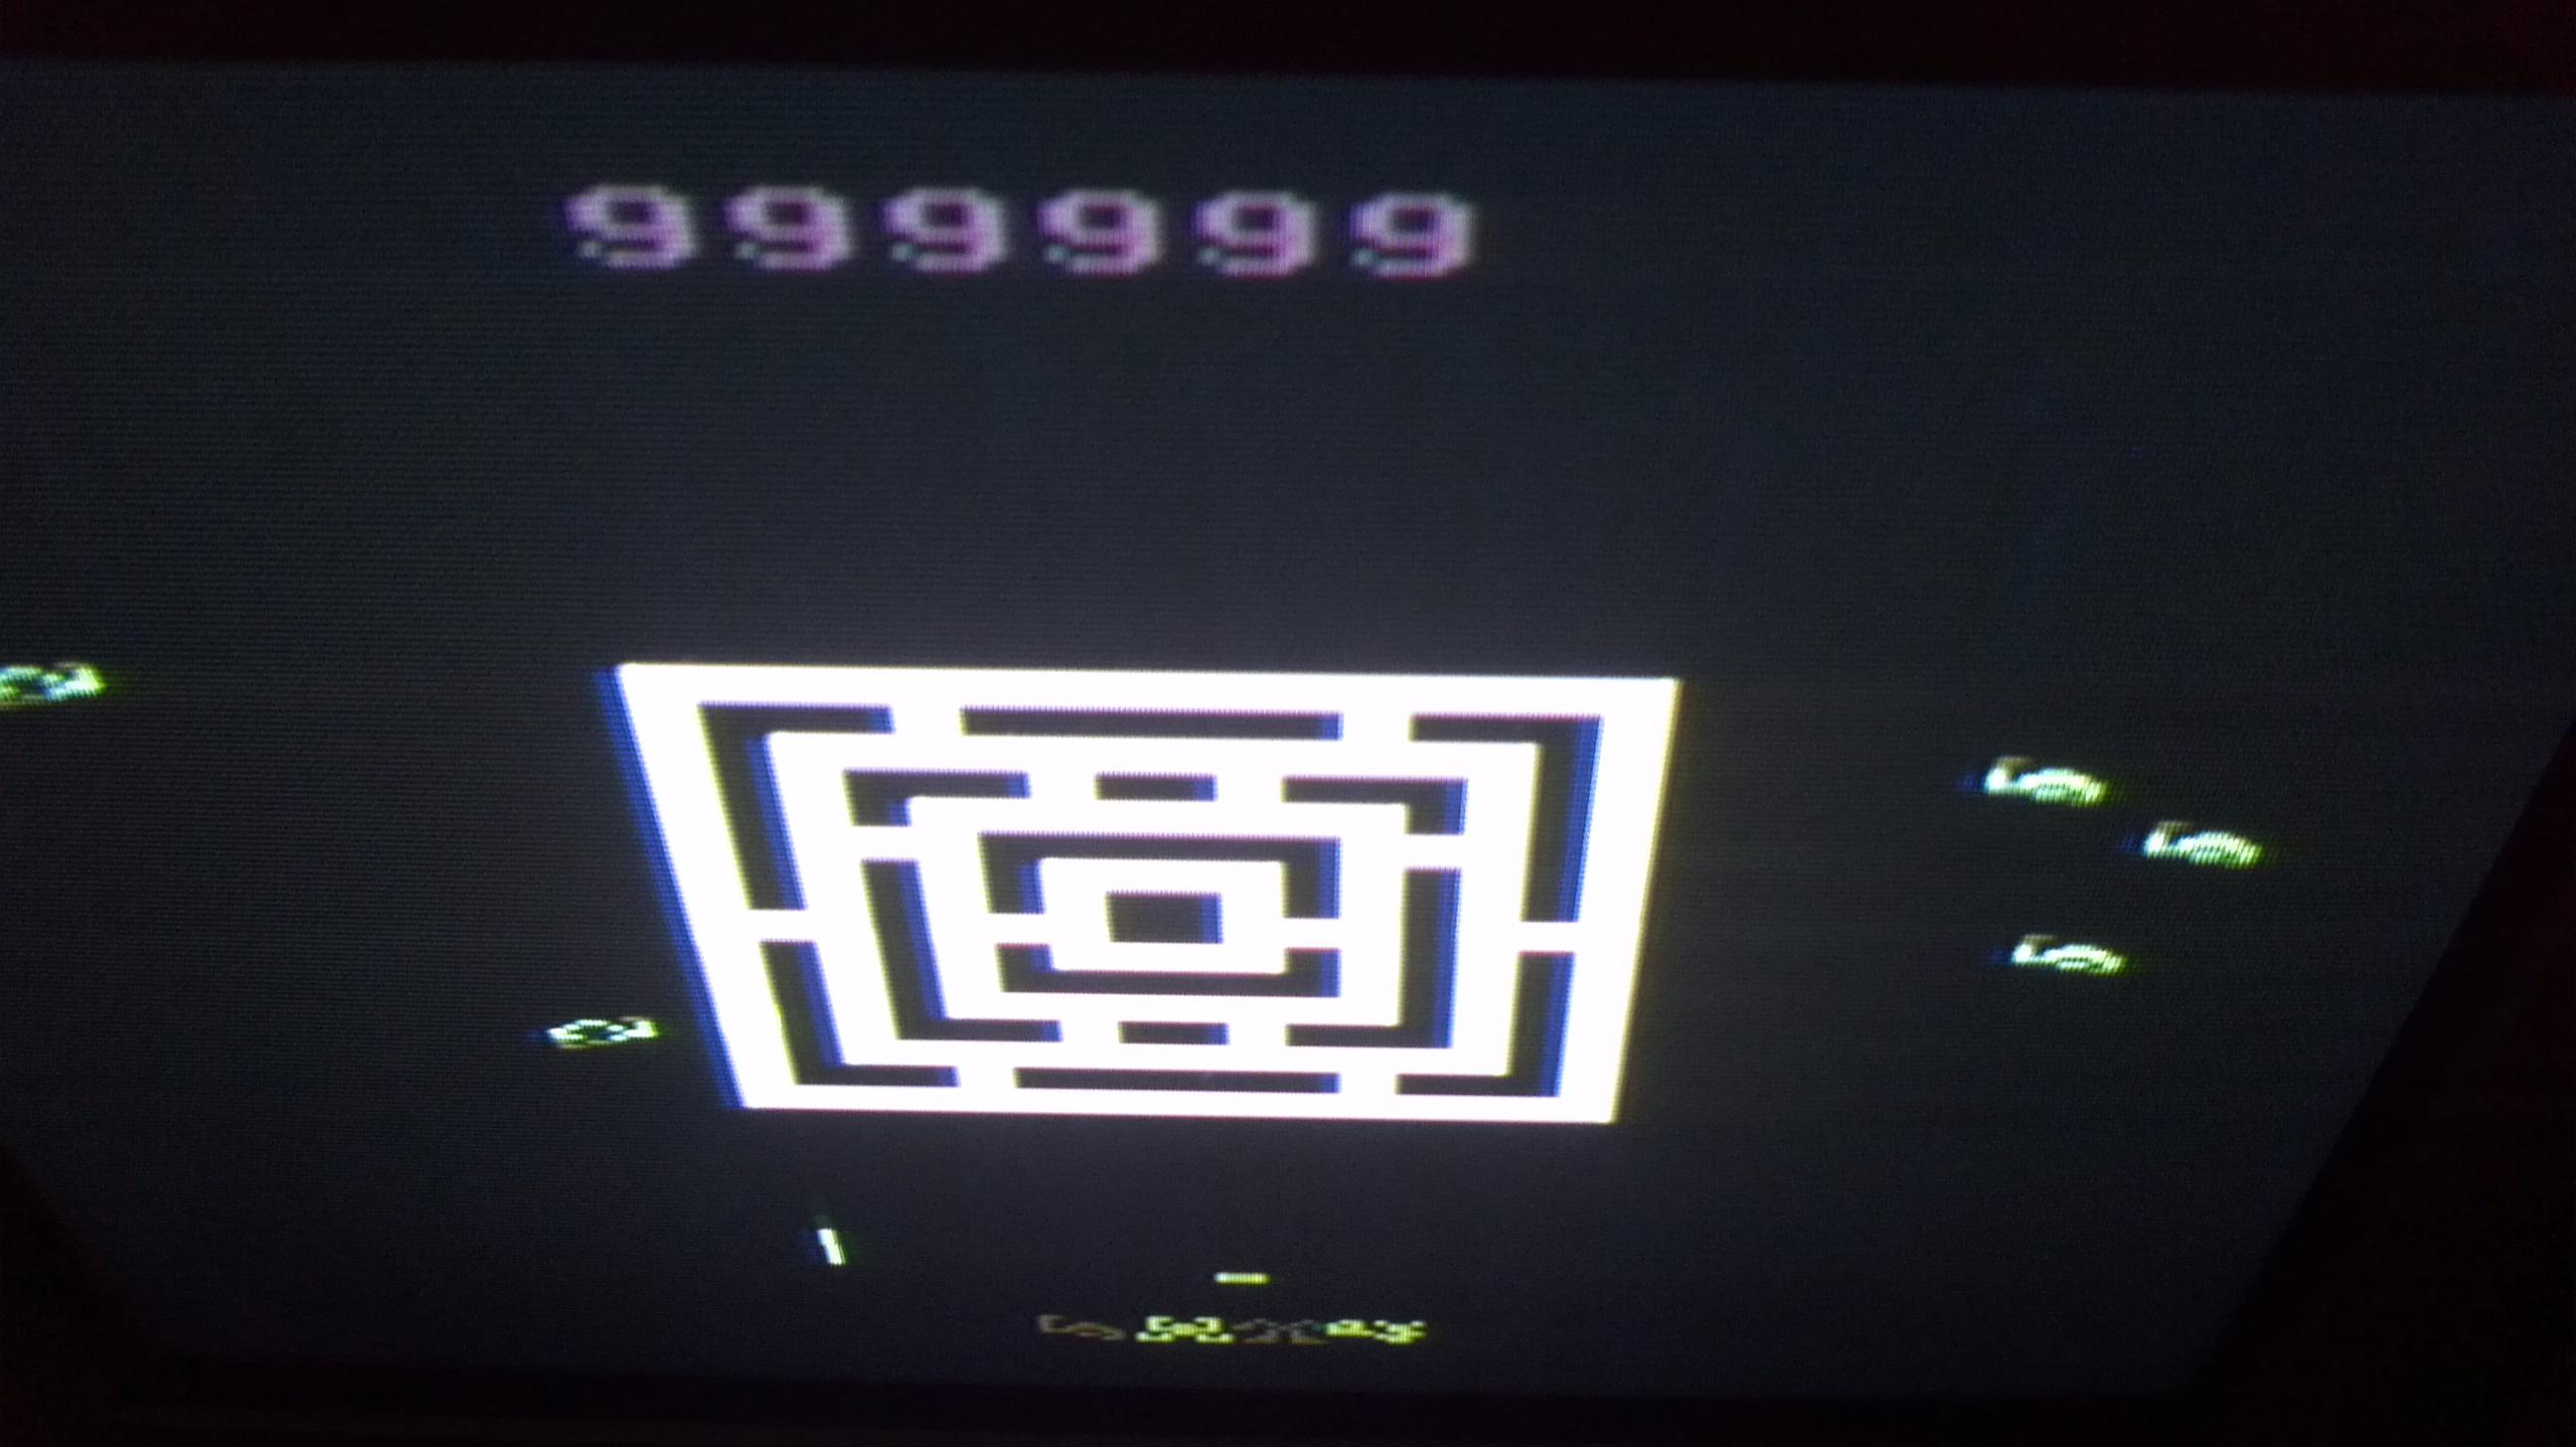 Liduario: Wall Defender (Atari 2600 Novice/B) 999,999 points on 2014-03-16 17:33:01